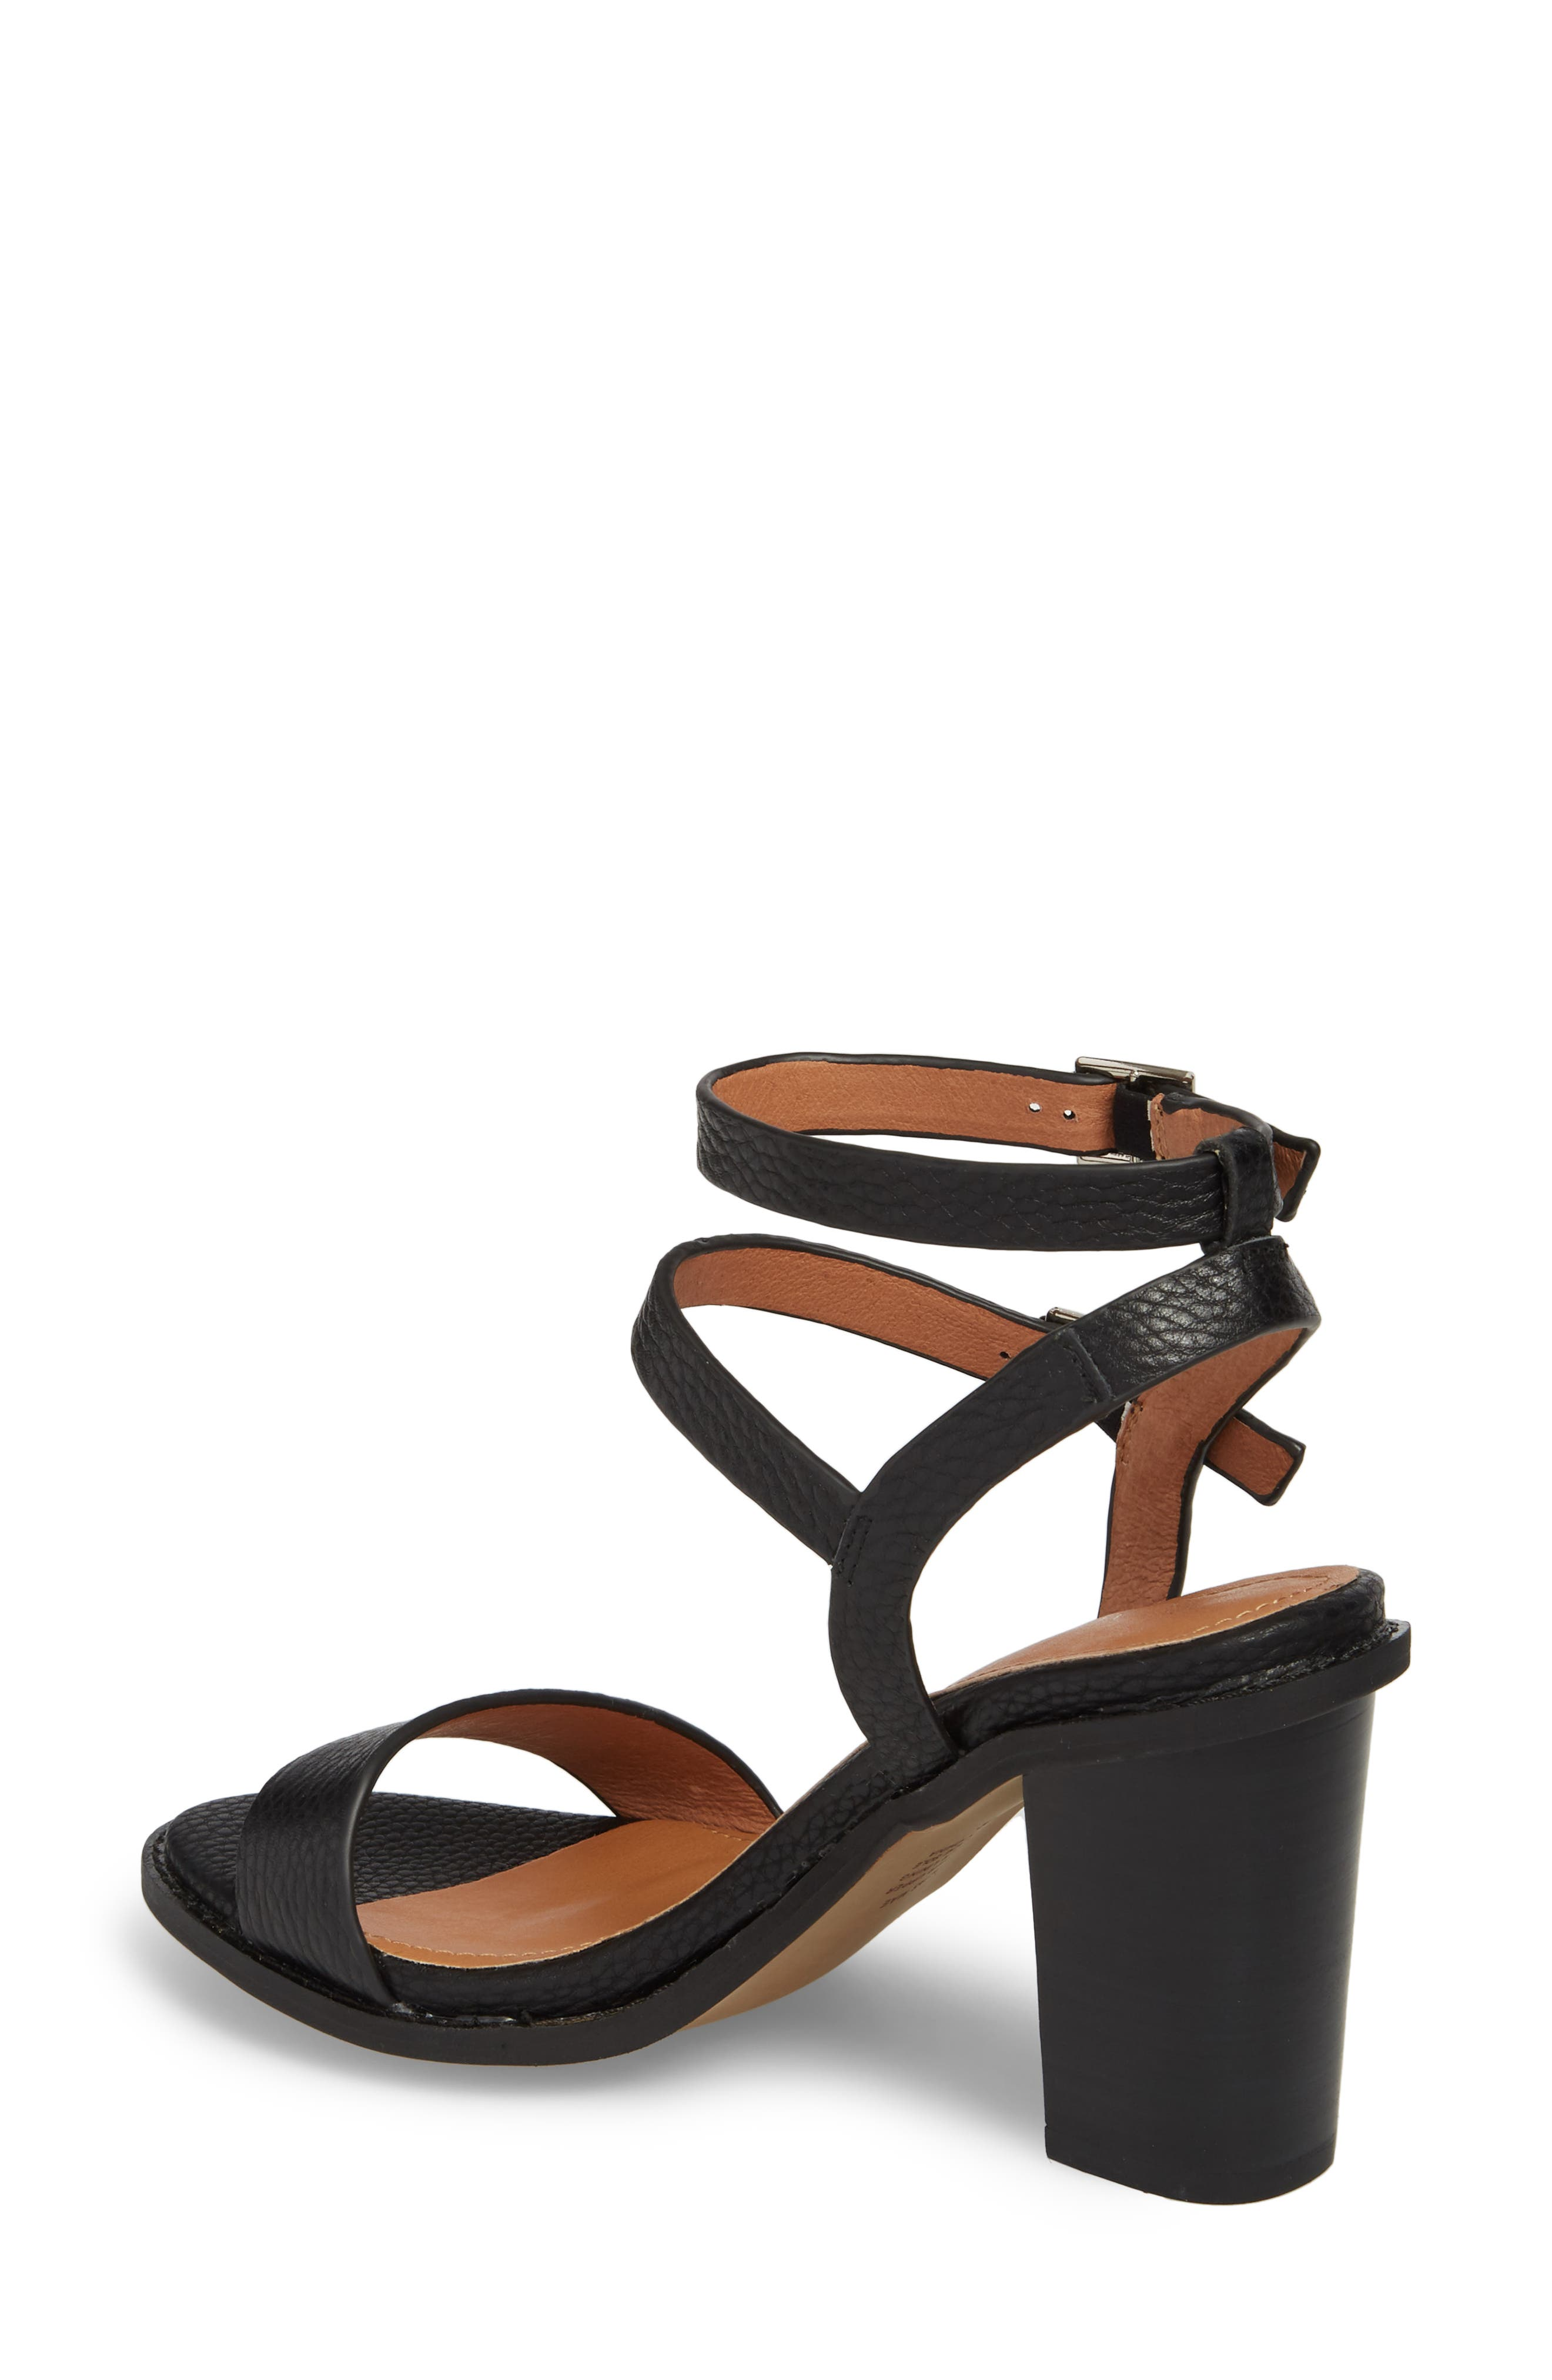 Elapse Sandal,                             Alternate thumbnail 2, color,                             Black Leather